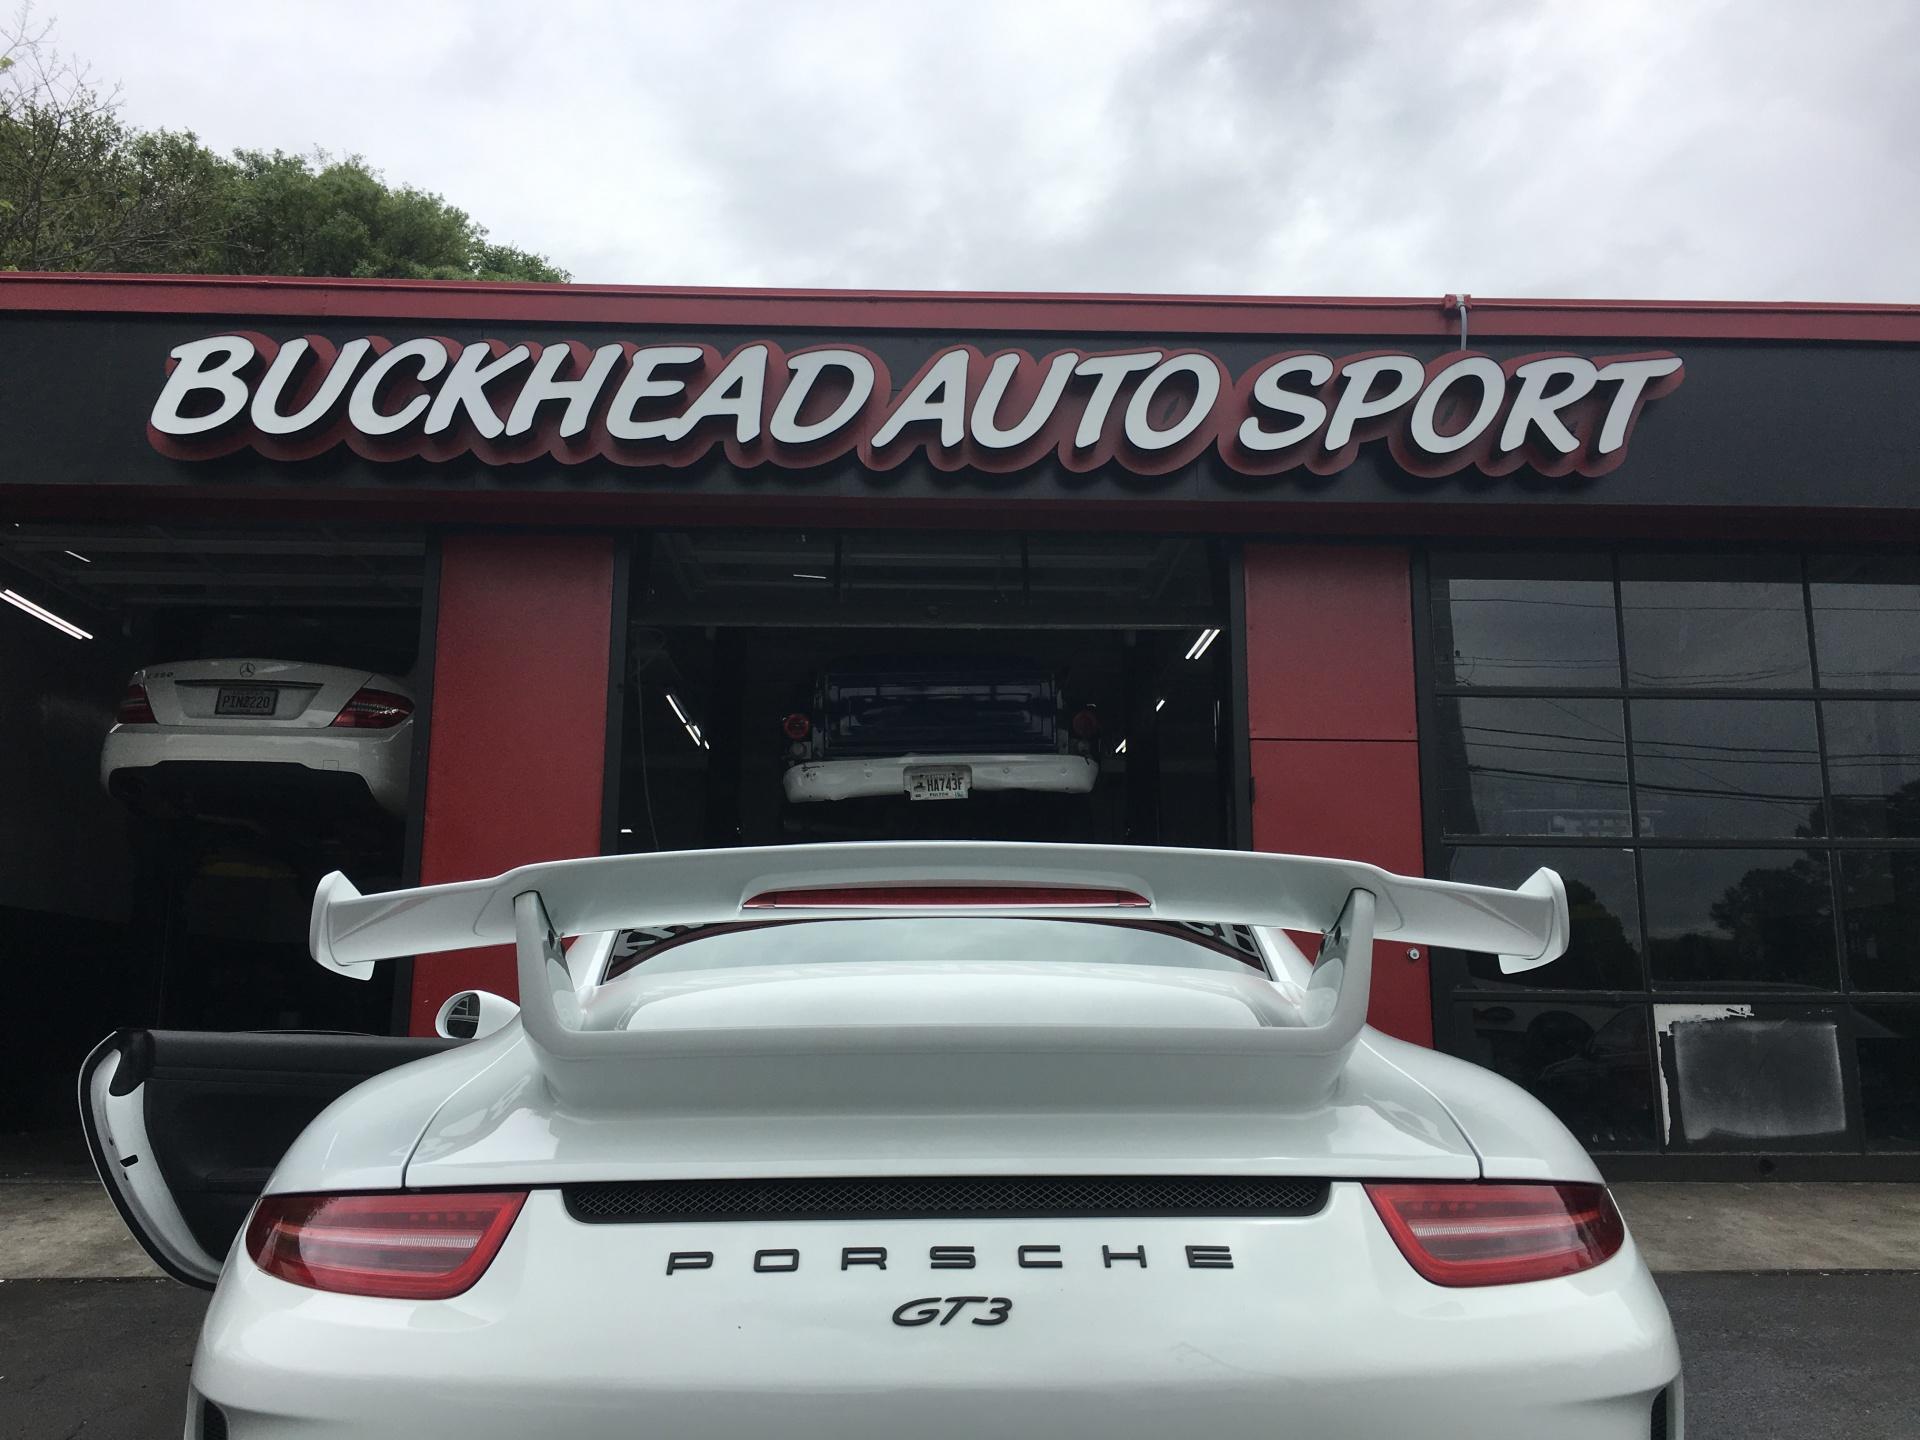 Buckhead Autosports Porsche